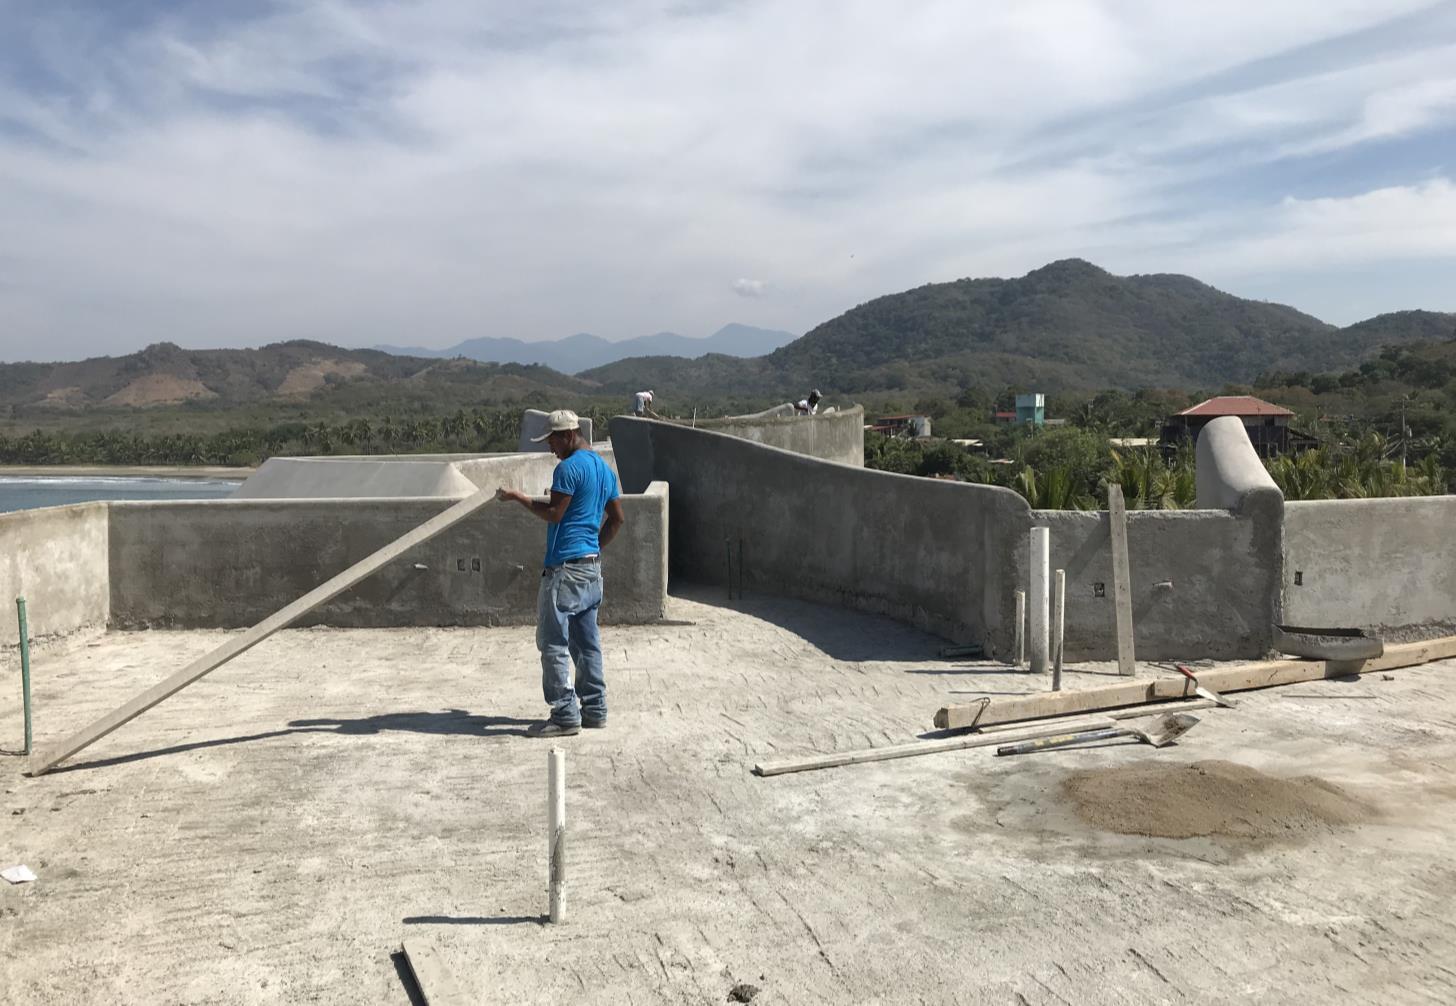 REPORTE-FOTOGRAFICO-PUNTA-MAJAHUA-21-DE-ENERO-DEL-2018-039.jpg